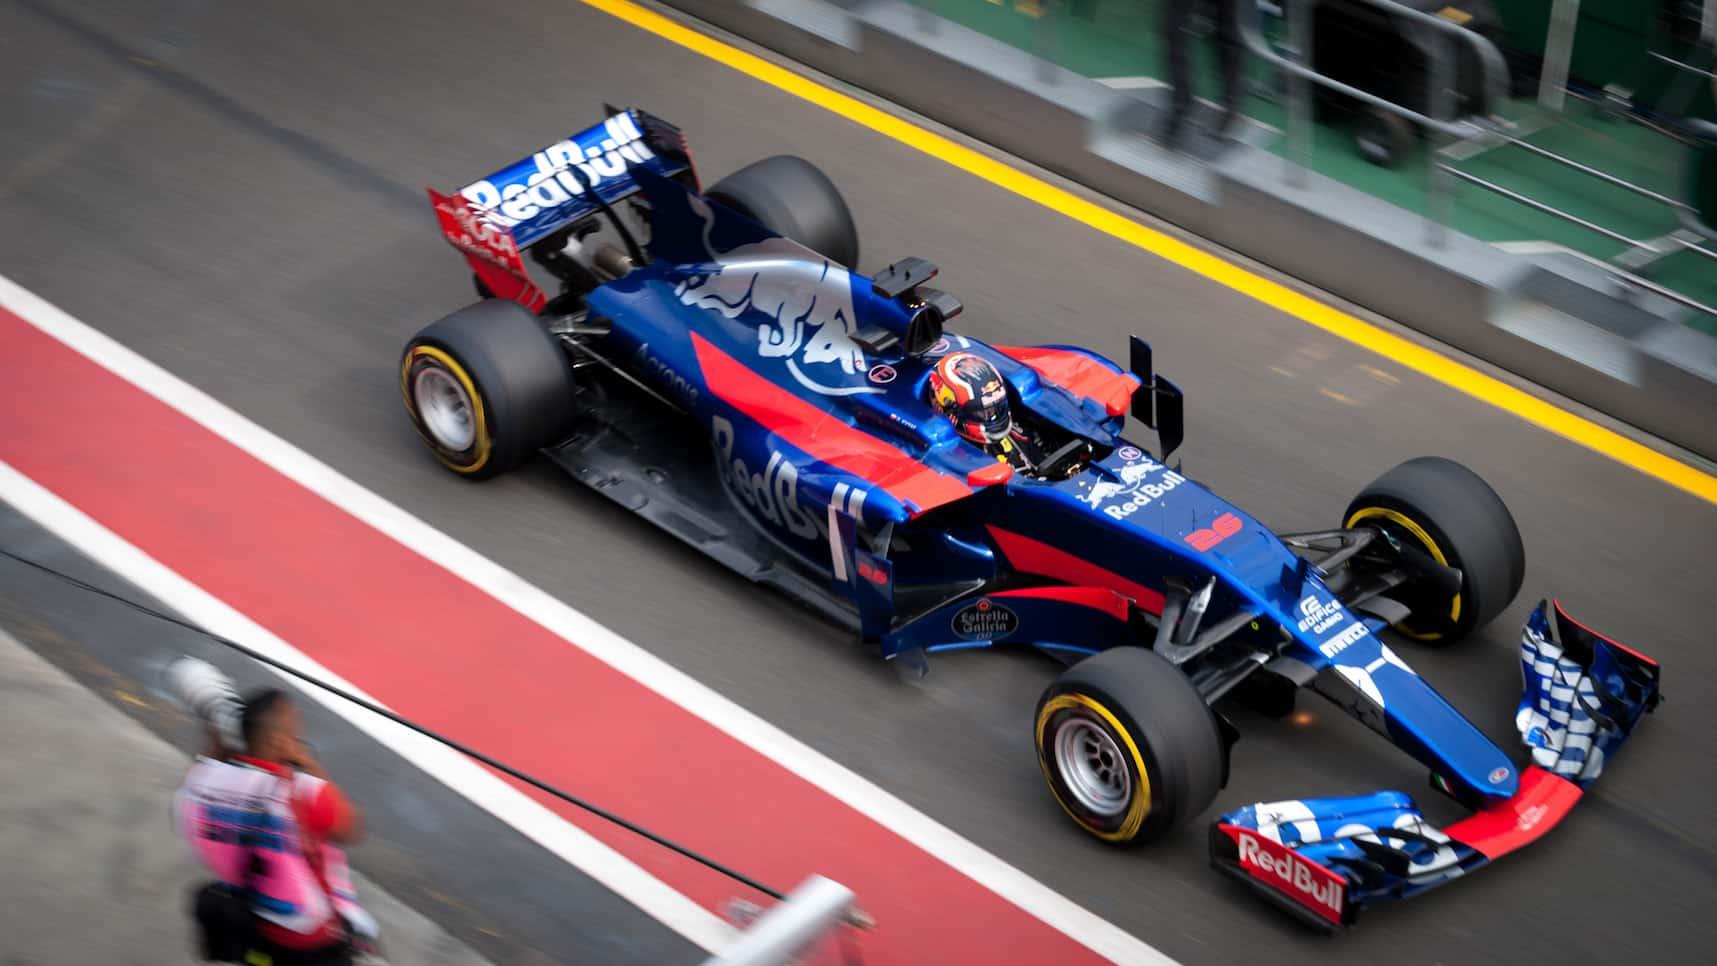 Budapest formula 1 Grand Prix